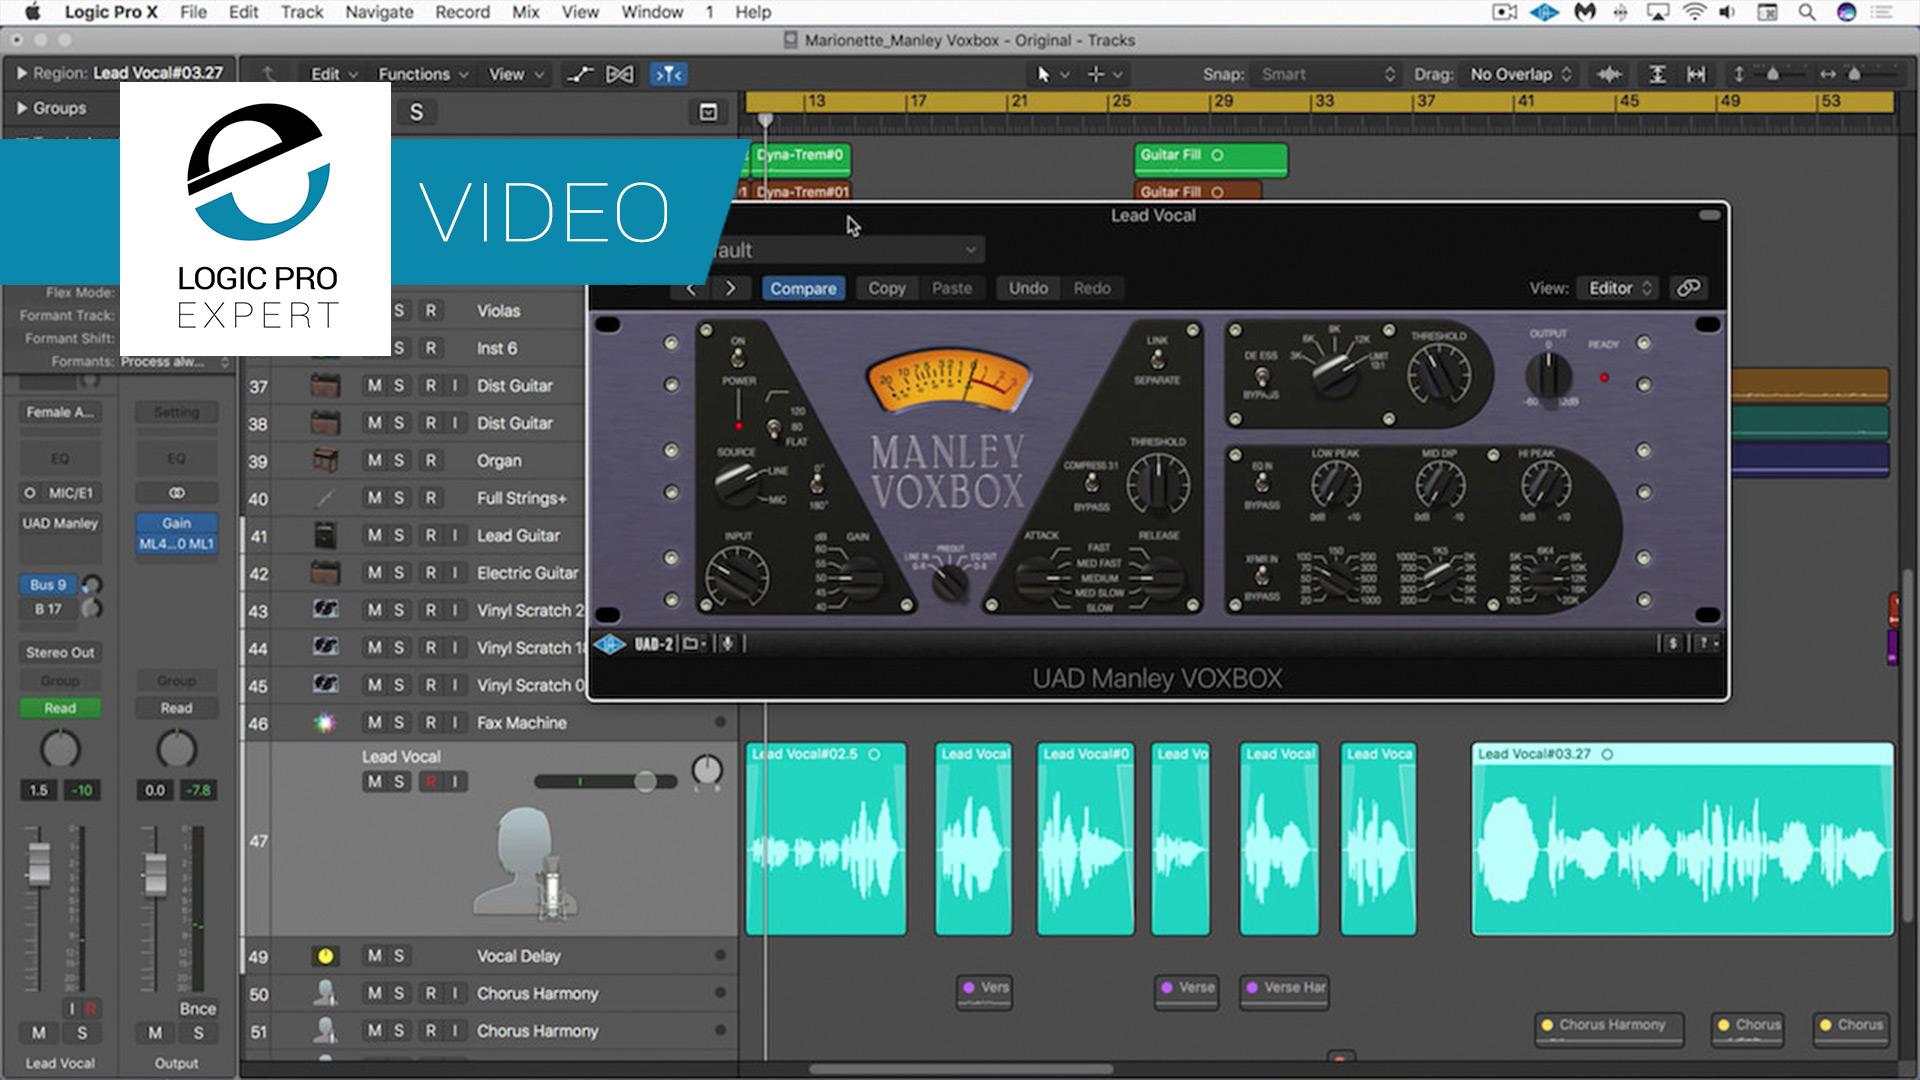 a screenshot of the Universal Audio Manley VoxBox channel strip plugin in Logic Pro X